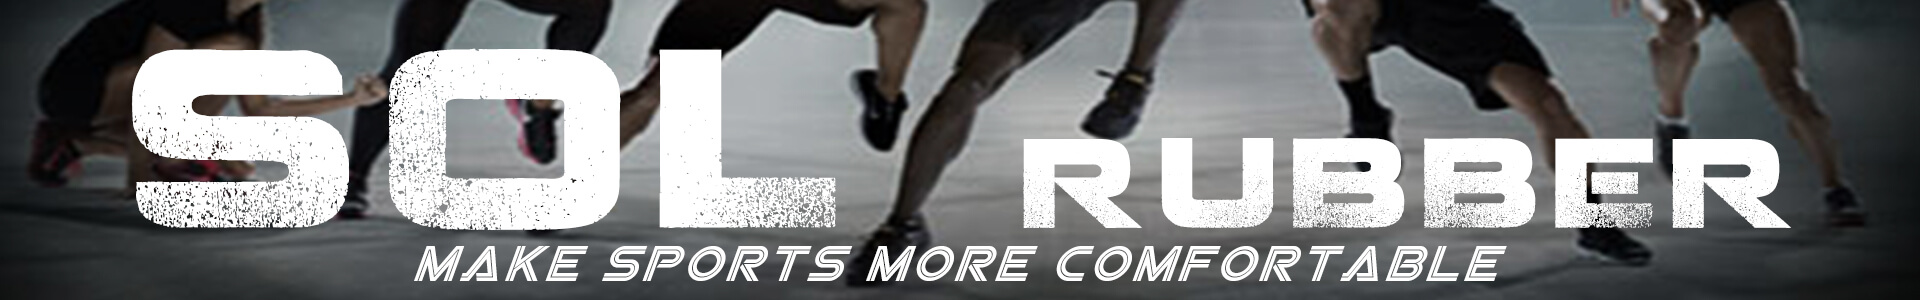 8mm Fitness Rolls Rubber Flooring Inc